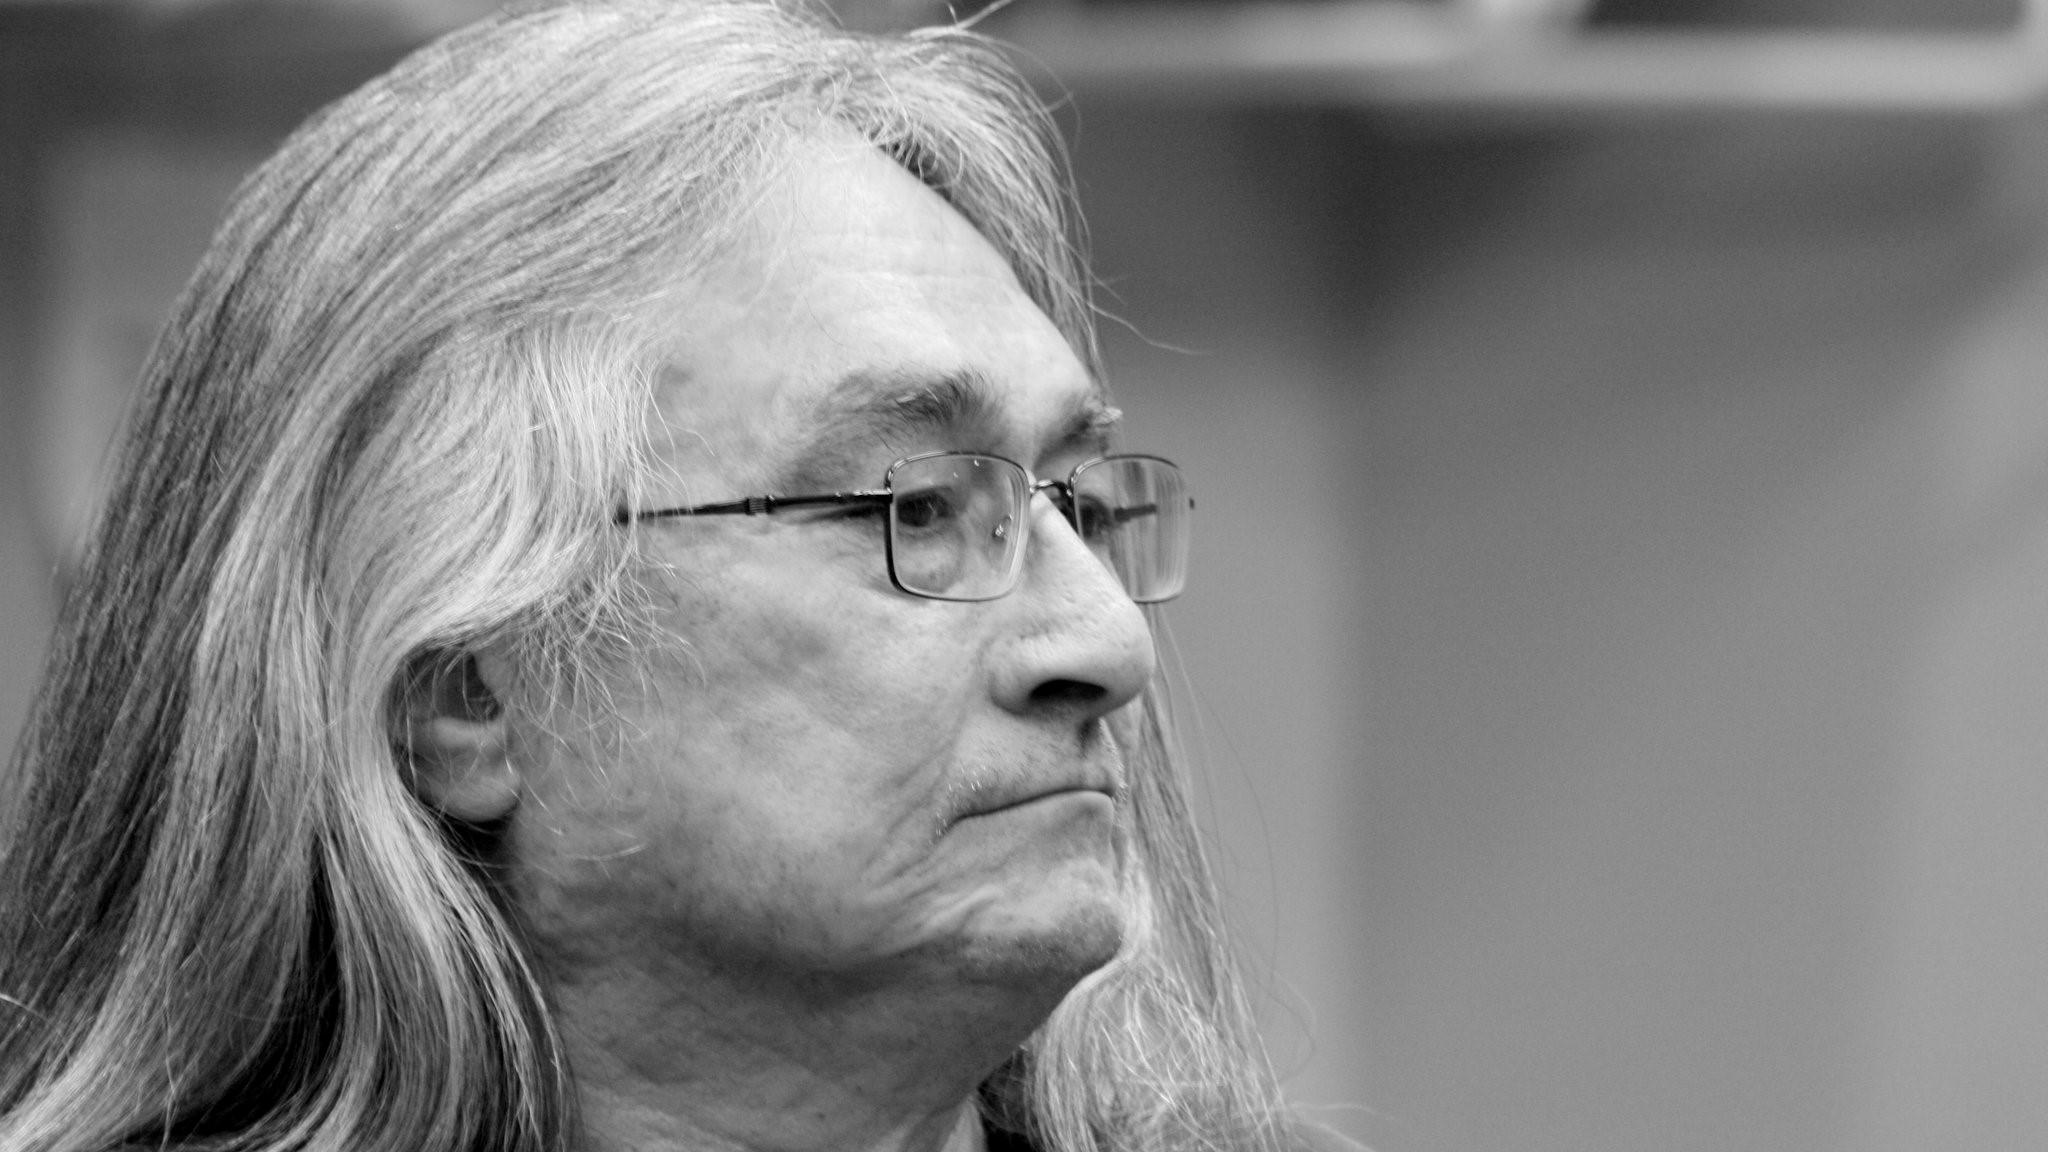 Duncan Mercredi